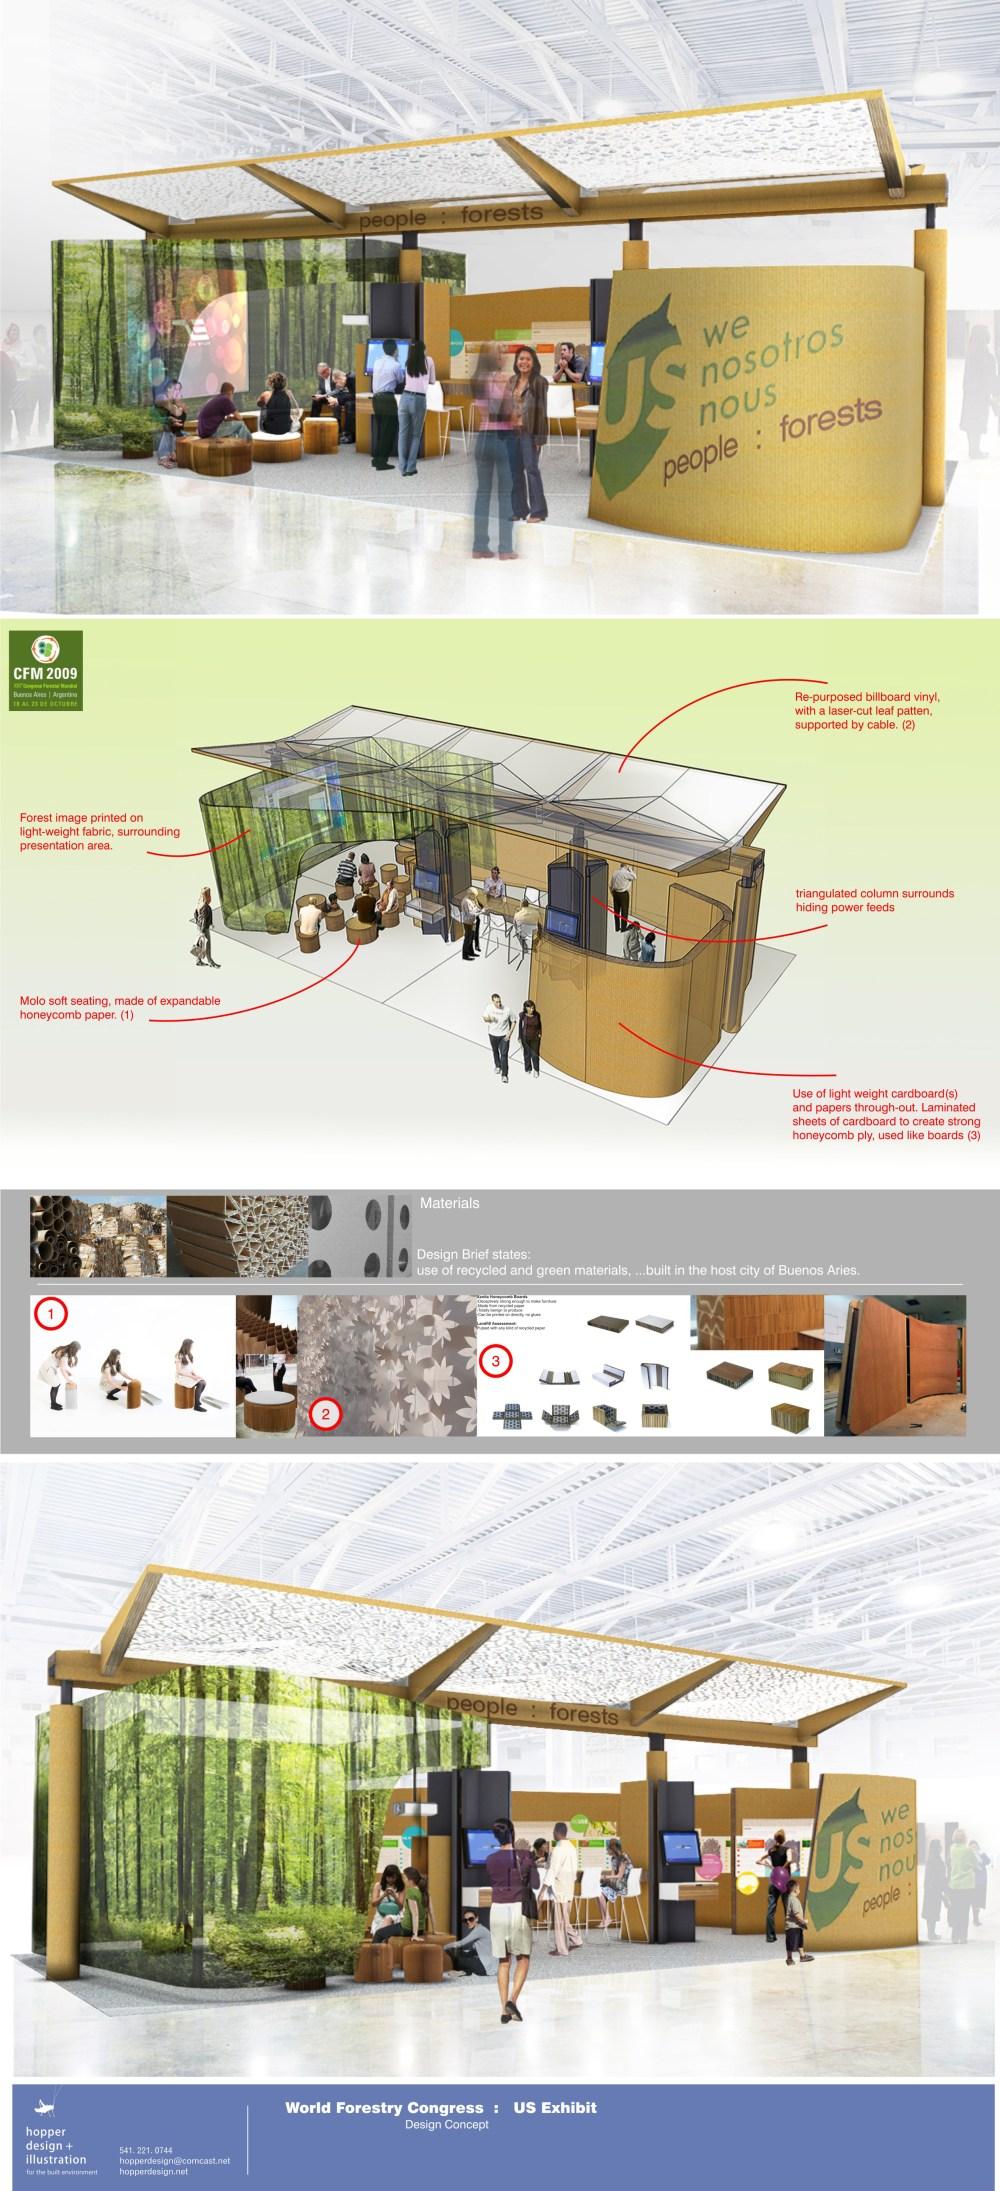 hopper_di_world_forestry_congress_layout